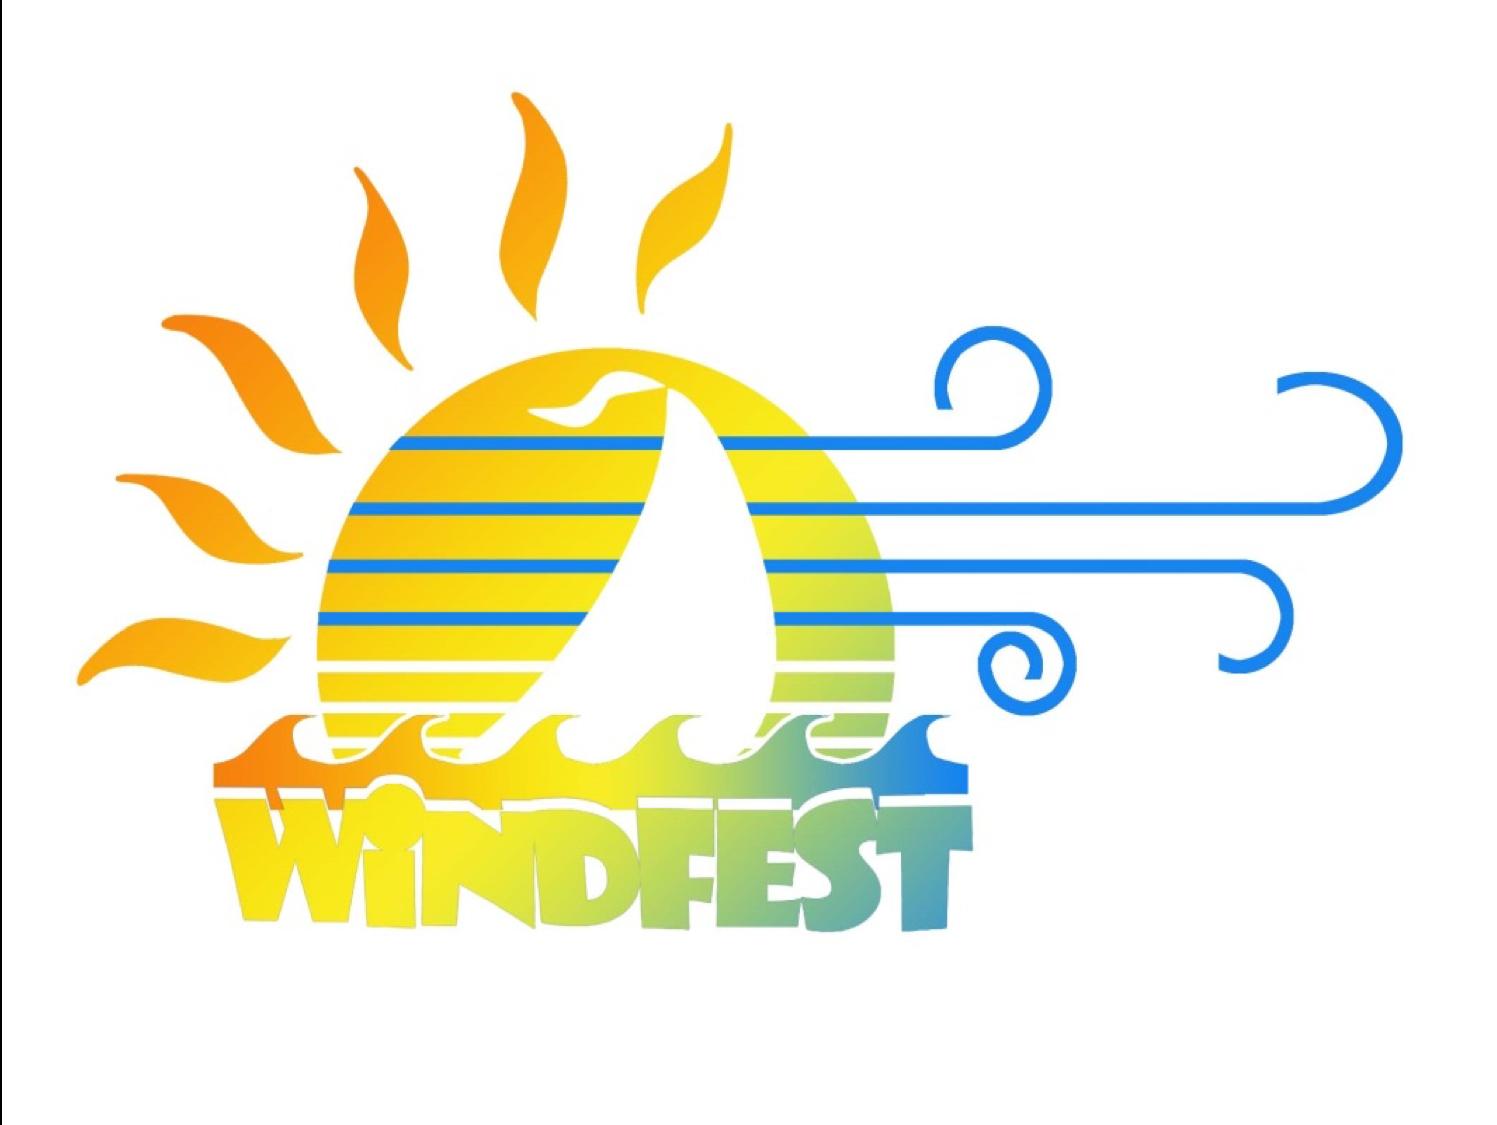 2019 windfest logo